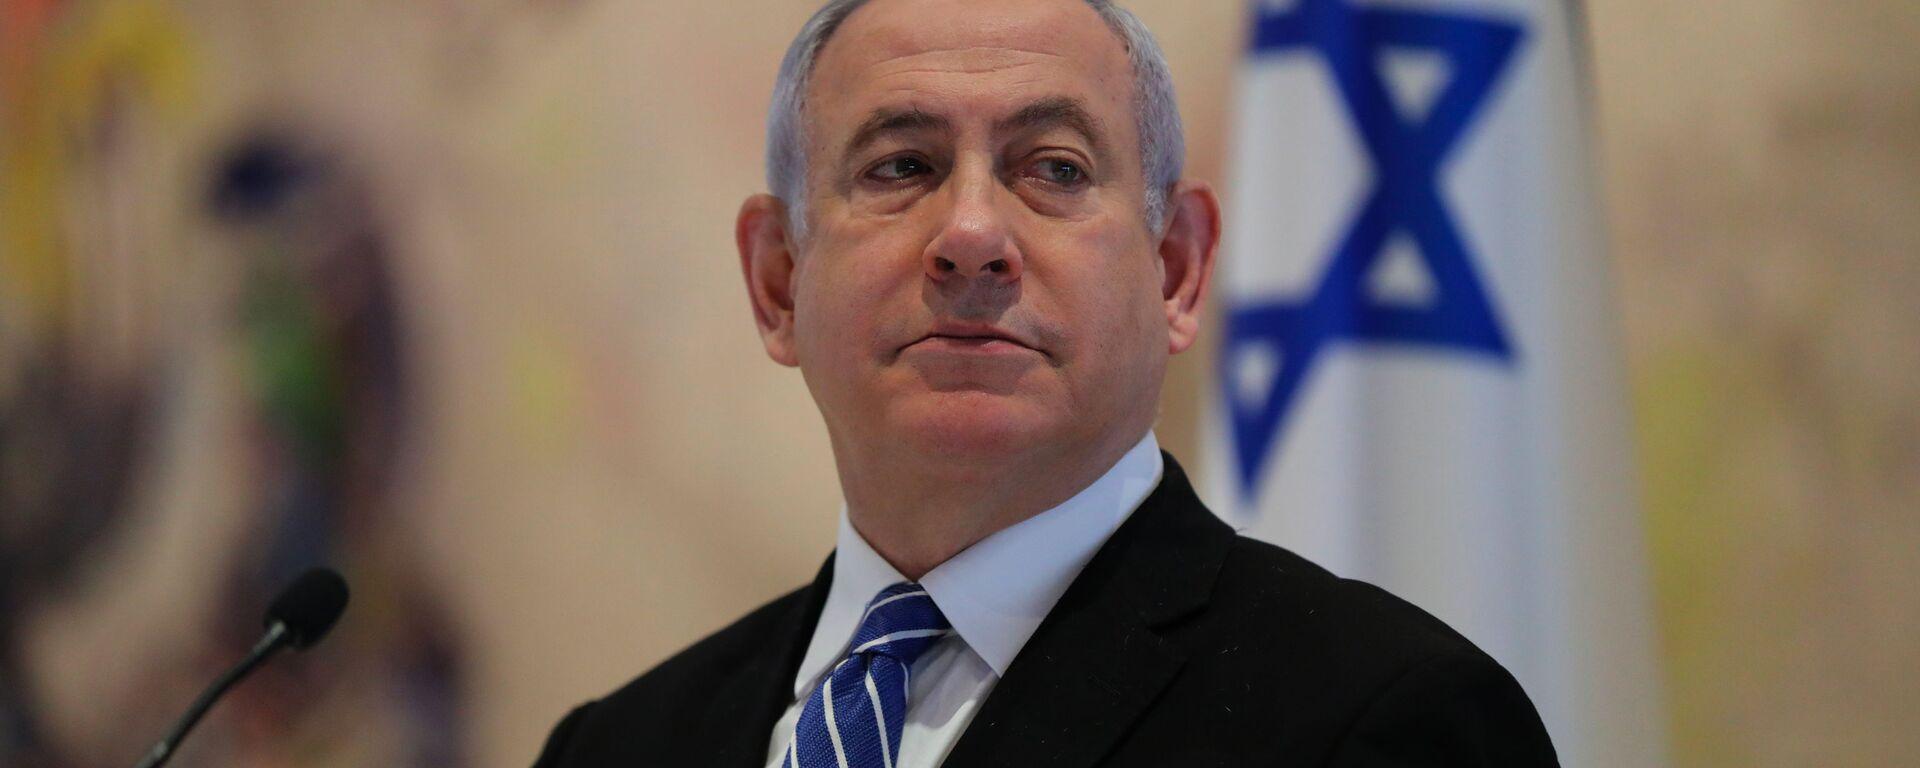 Il primo ministro dell'Israele Benjamin Netanyahu  - Sputnik Italia, 1920, 23.02.2021